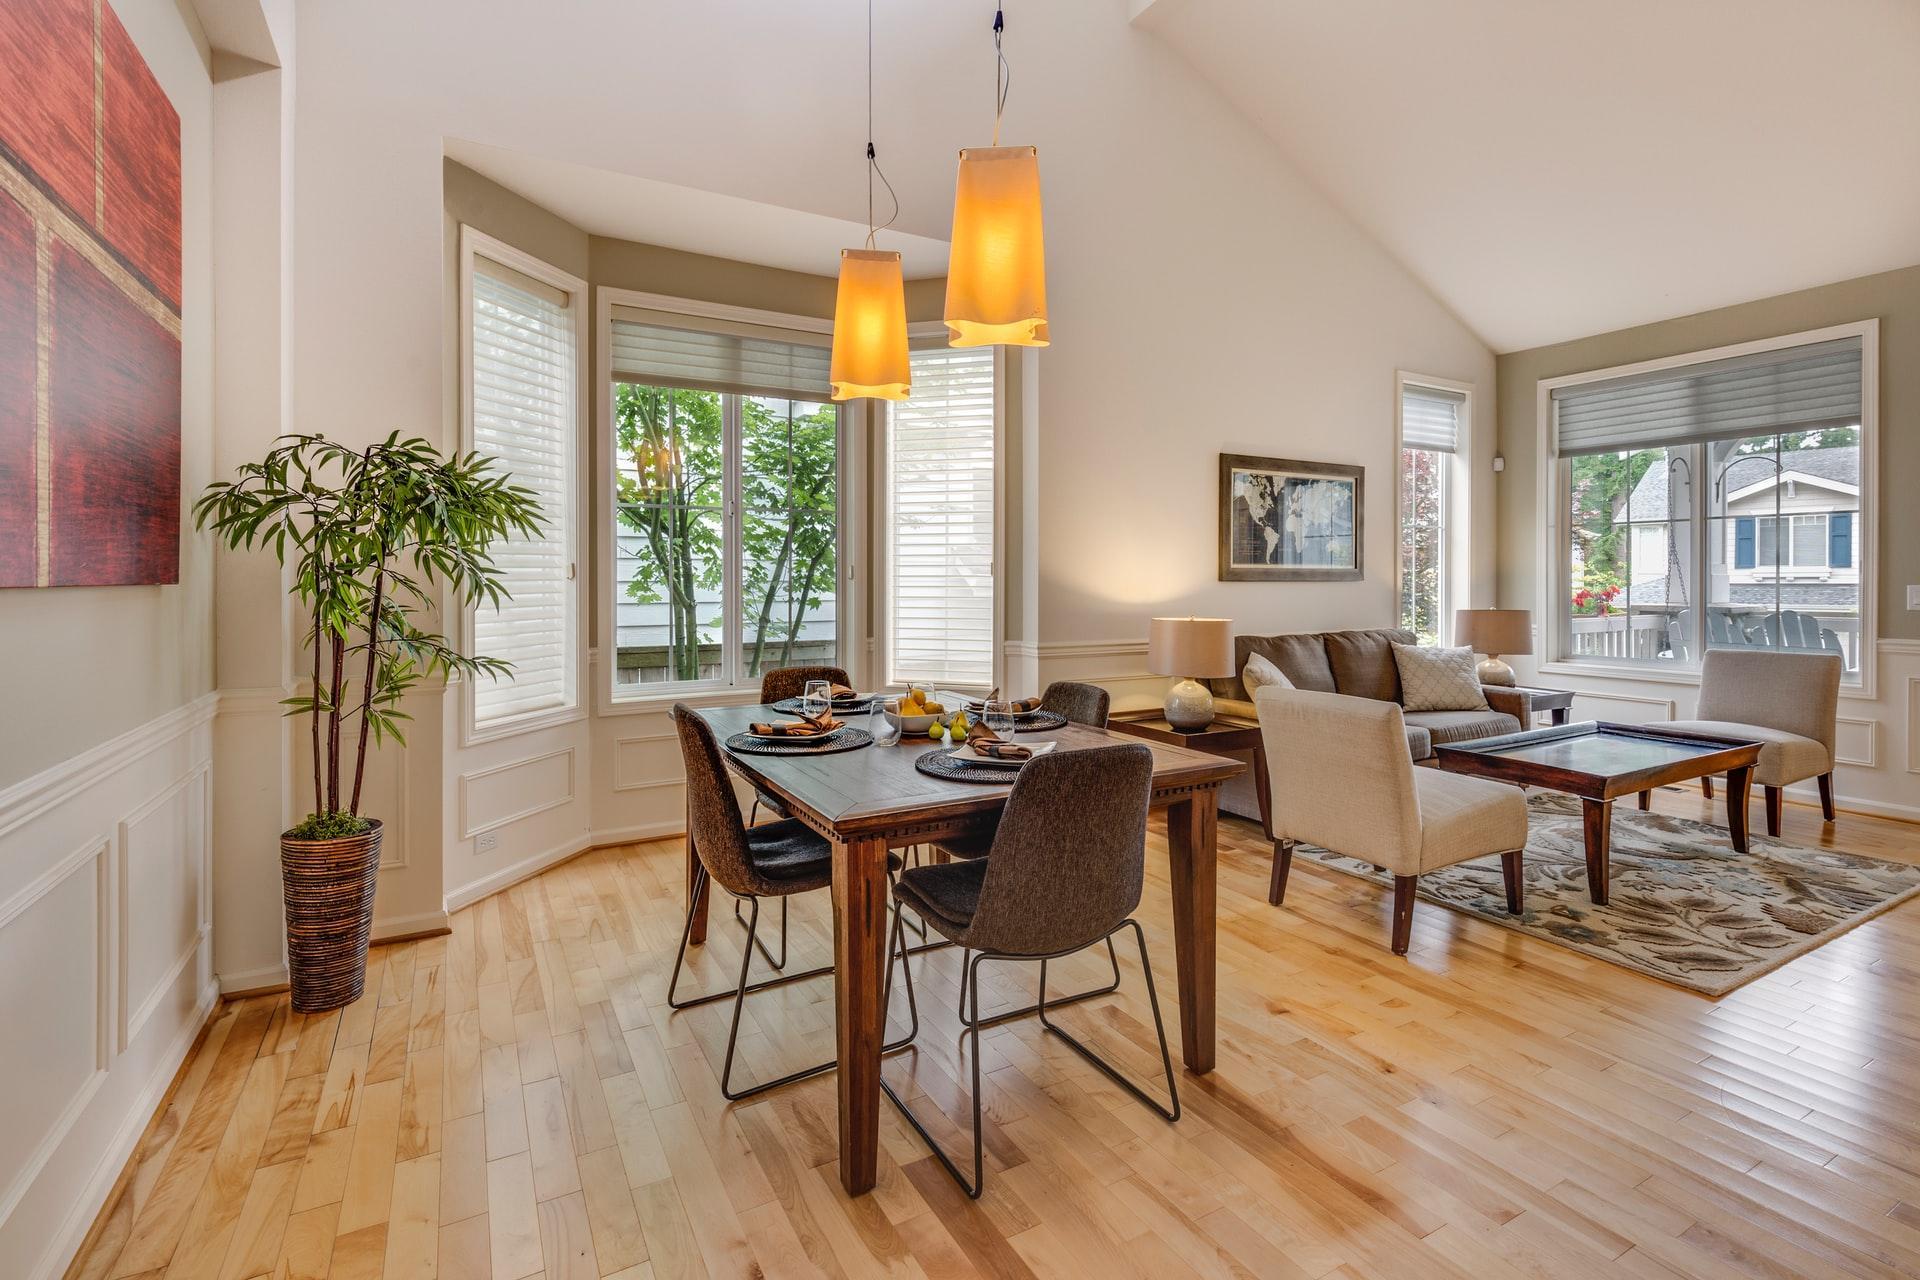 resale value property